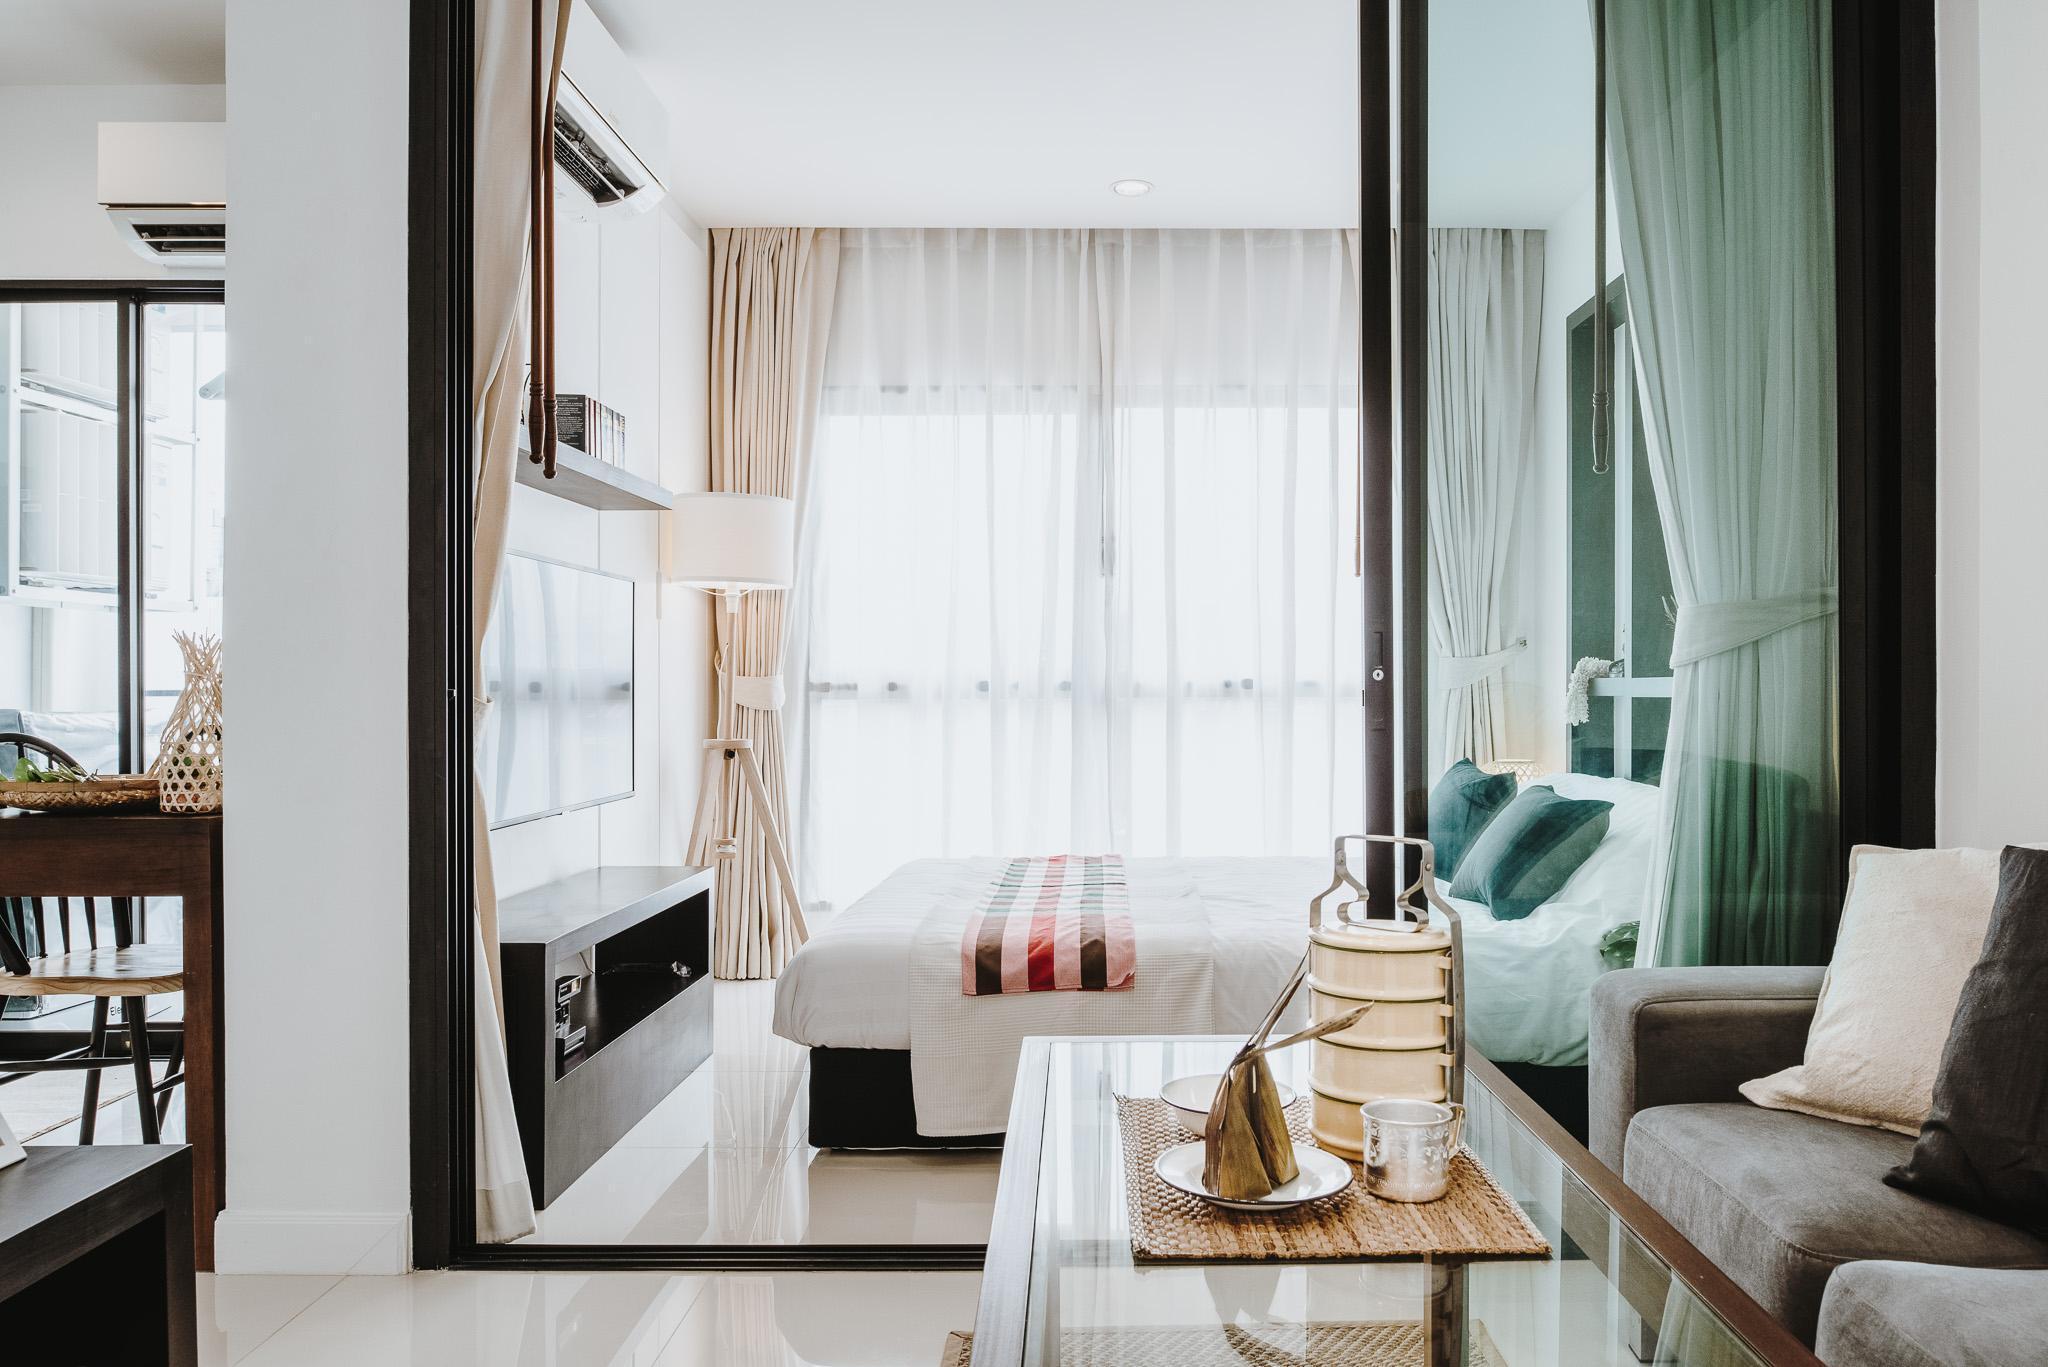 Siamplaengna Residence อพาร์ตเมนต์ 1 ห้องนอน 1 ห้องน้ำส่วนตัว ขนาด 26 ตร.ม. – รัชดาภิเษก